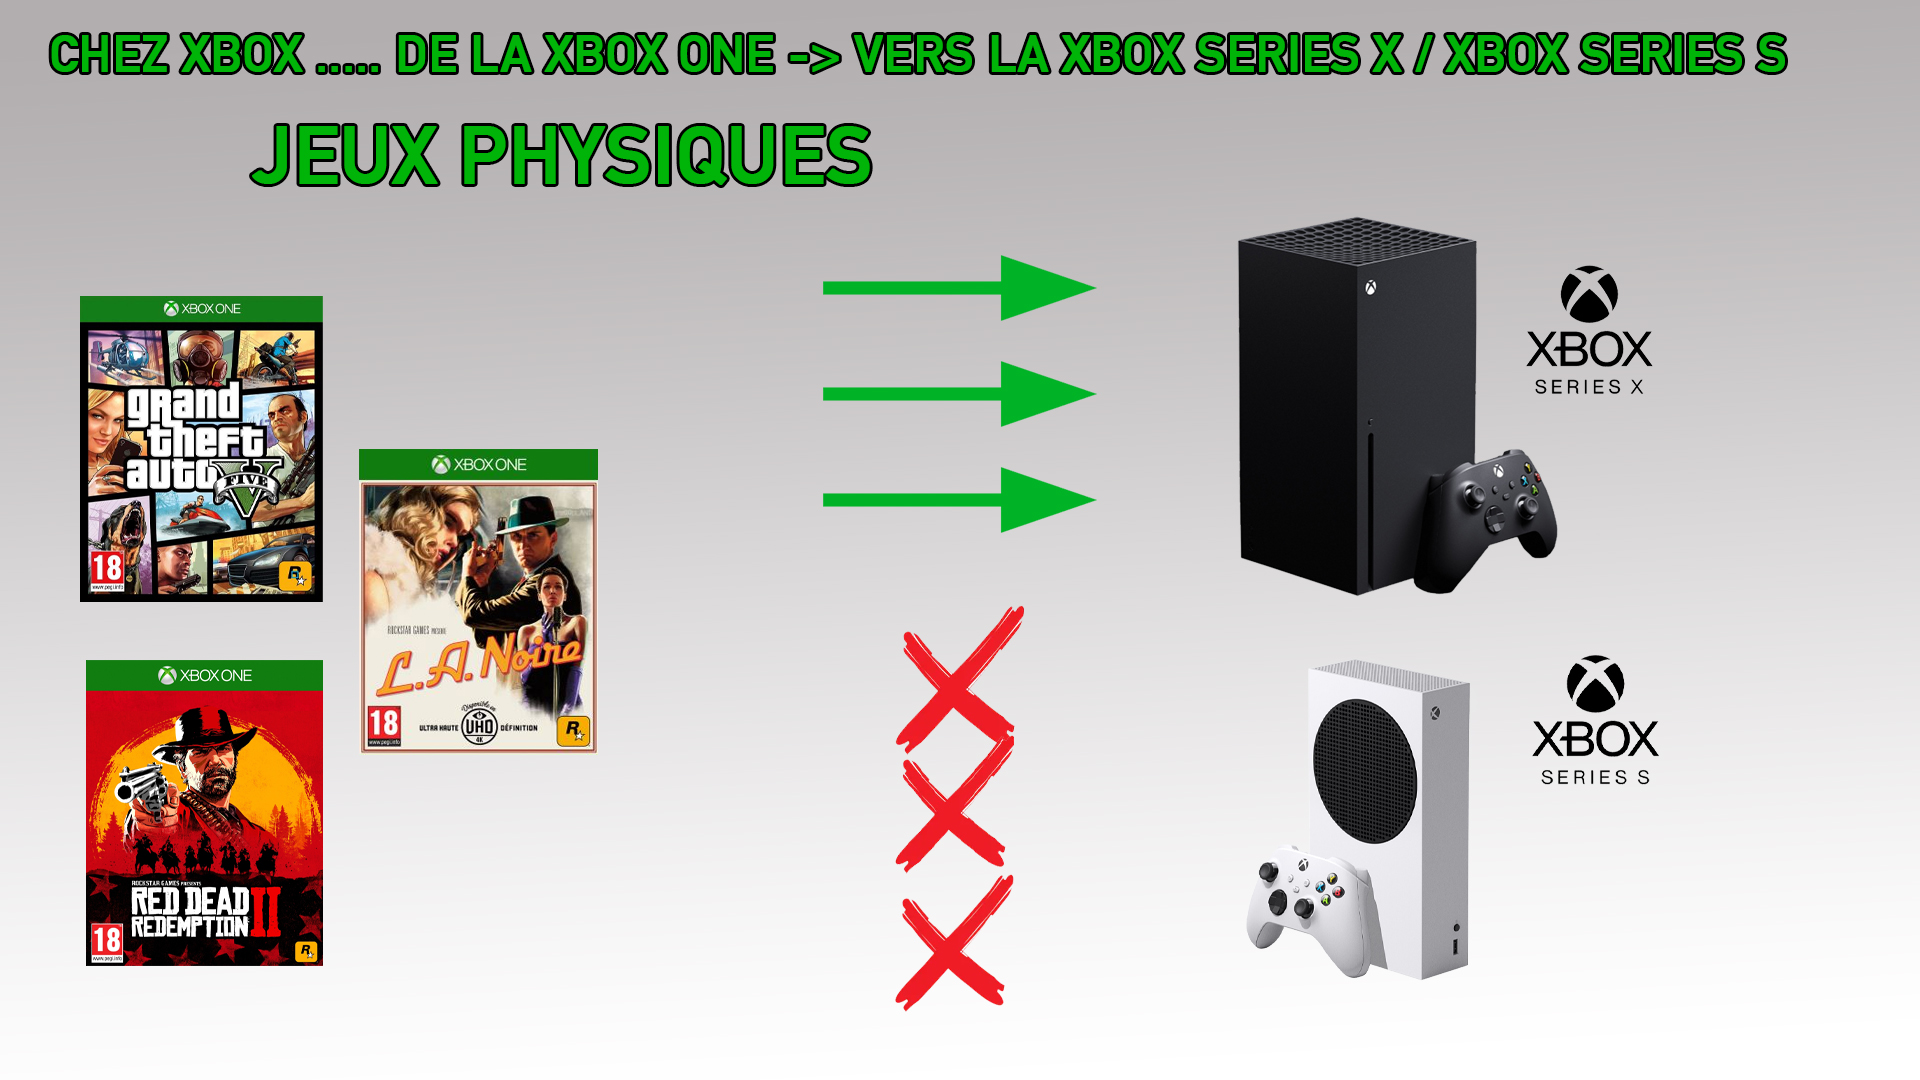 bilan-xbox-jeux-rockstar-games-physiques